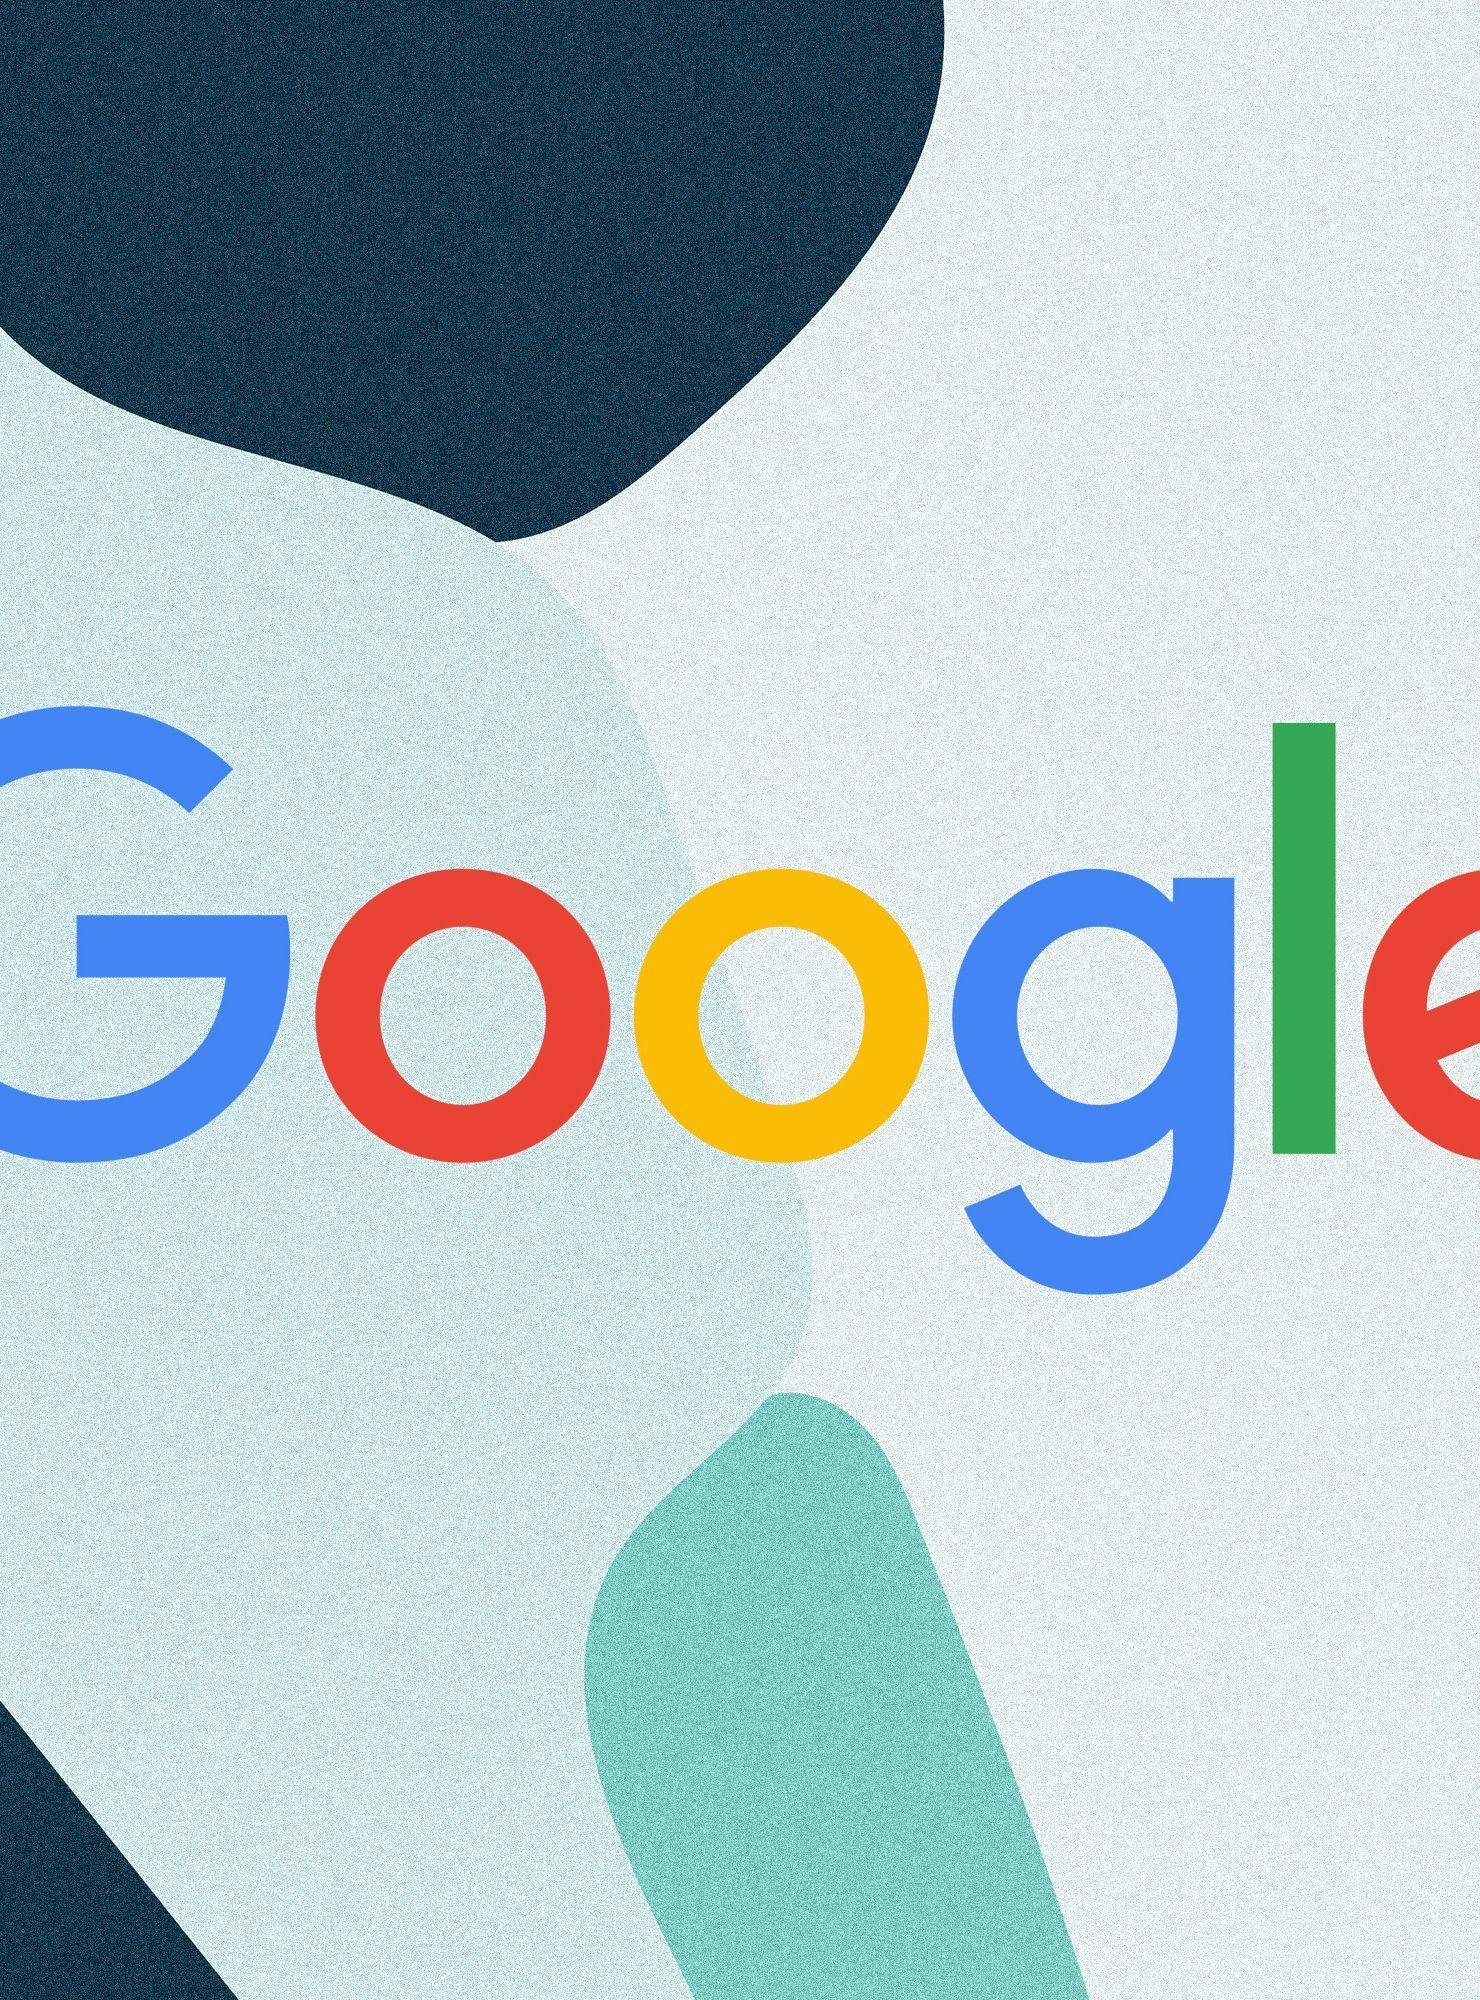 doodle for google 2014 theme Google Doodle Google